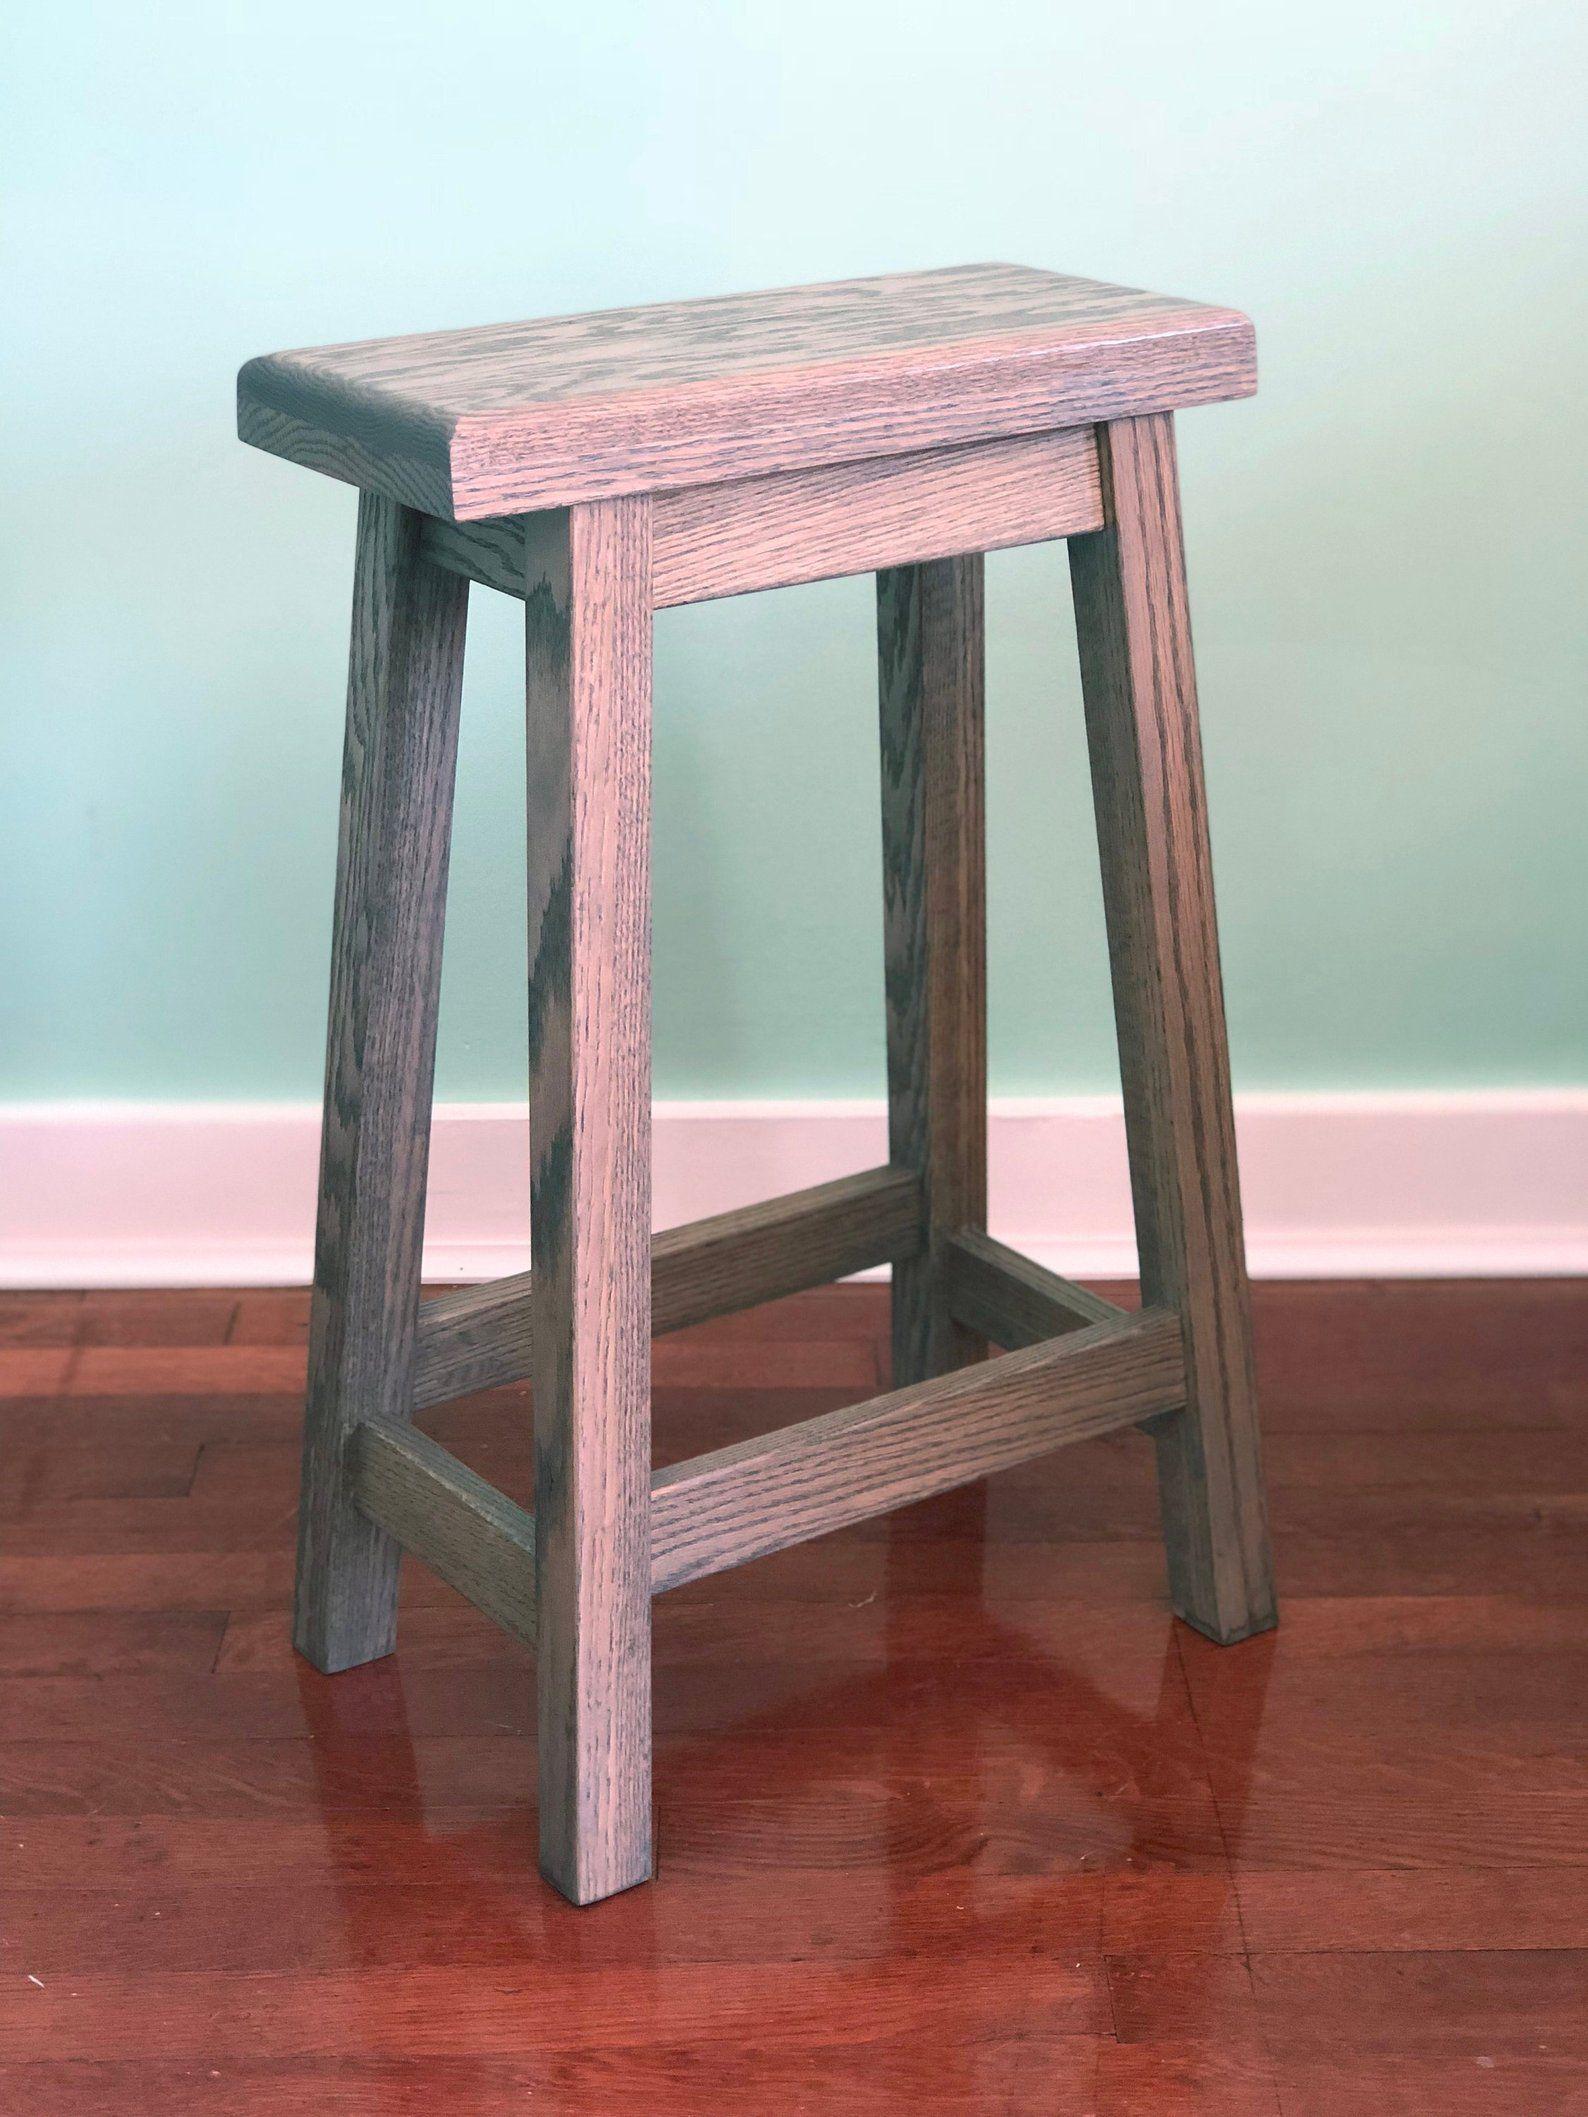 saddle stool 24 high  etsy  pub table sets high top